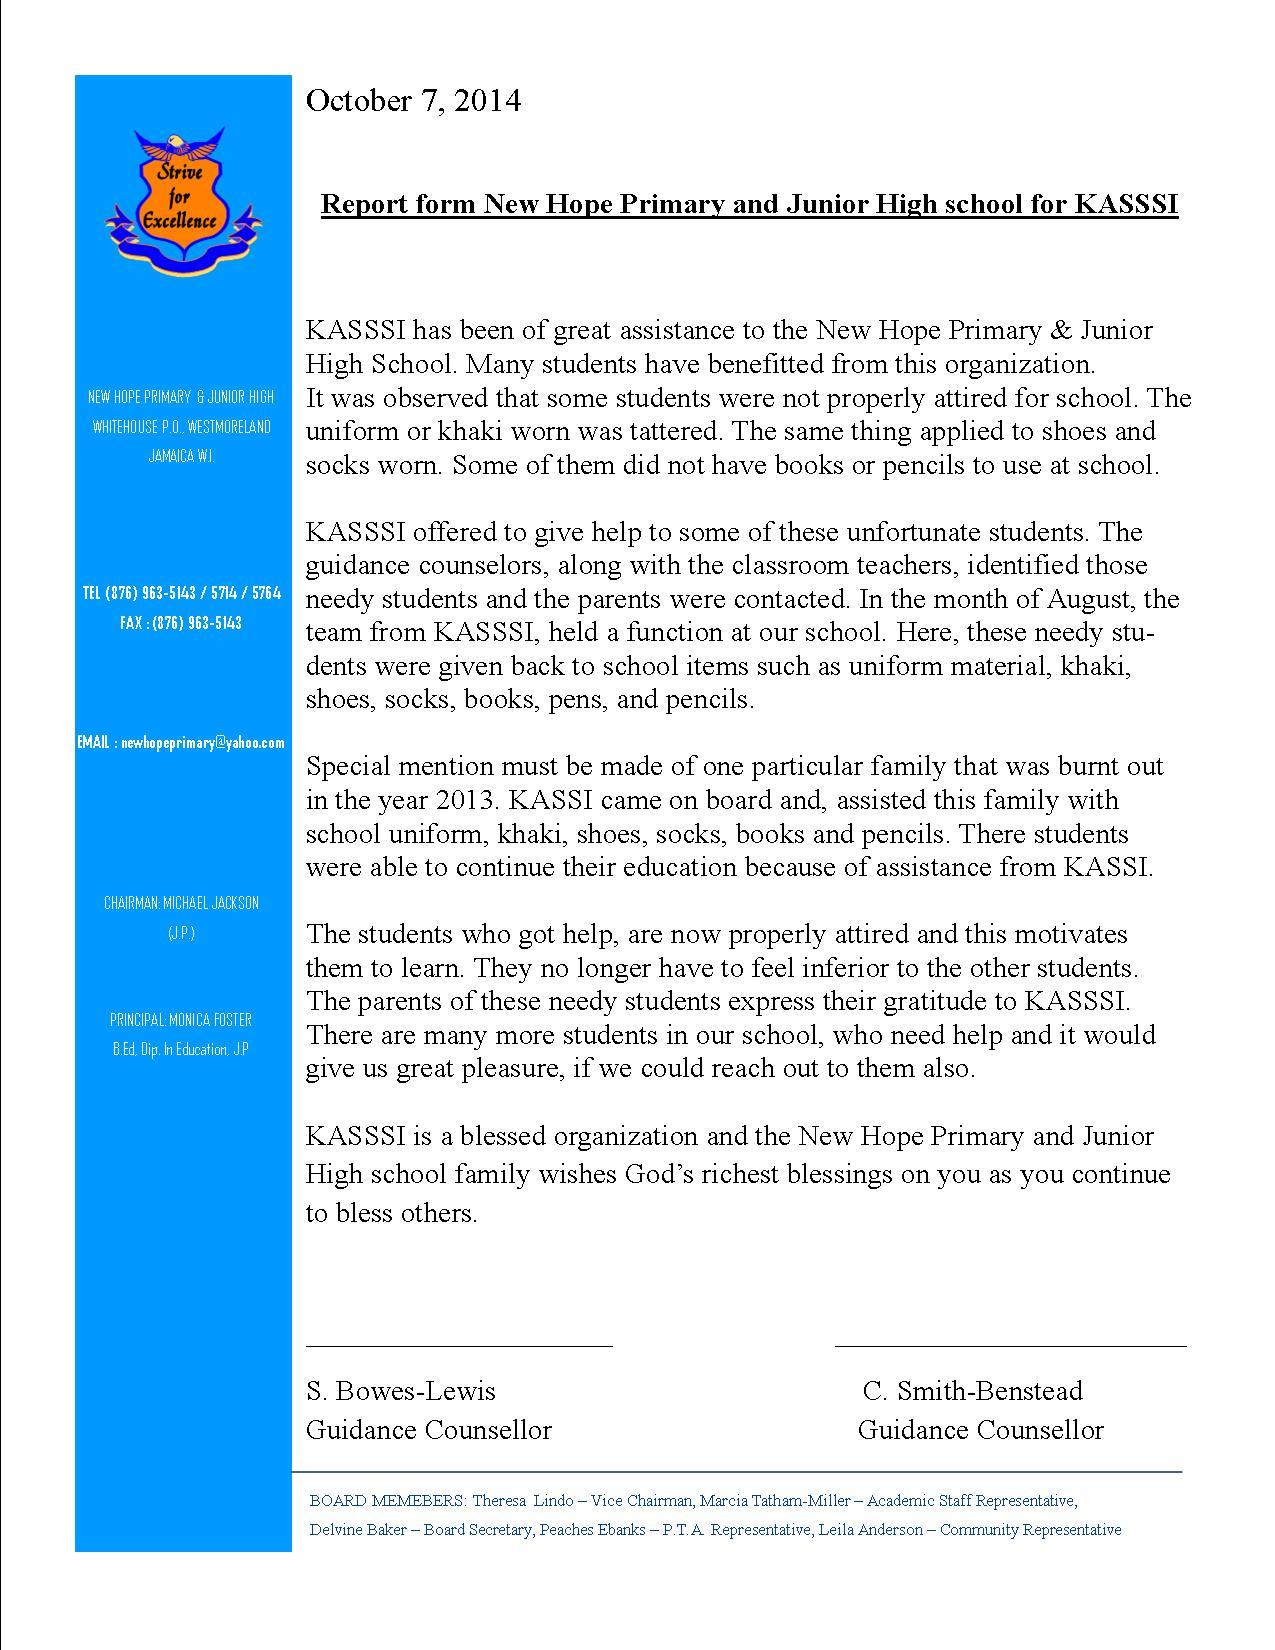 Exam Circulars Notifications Vtu Writing Reports For Primary School Children